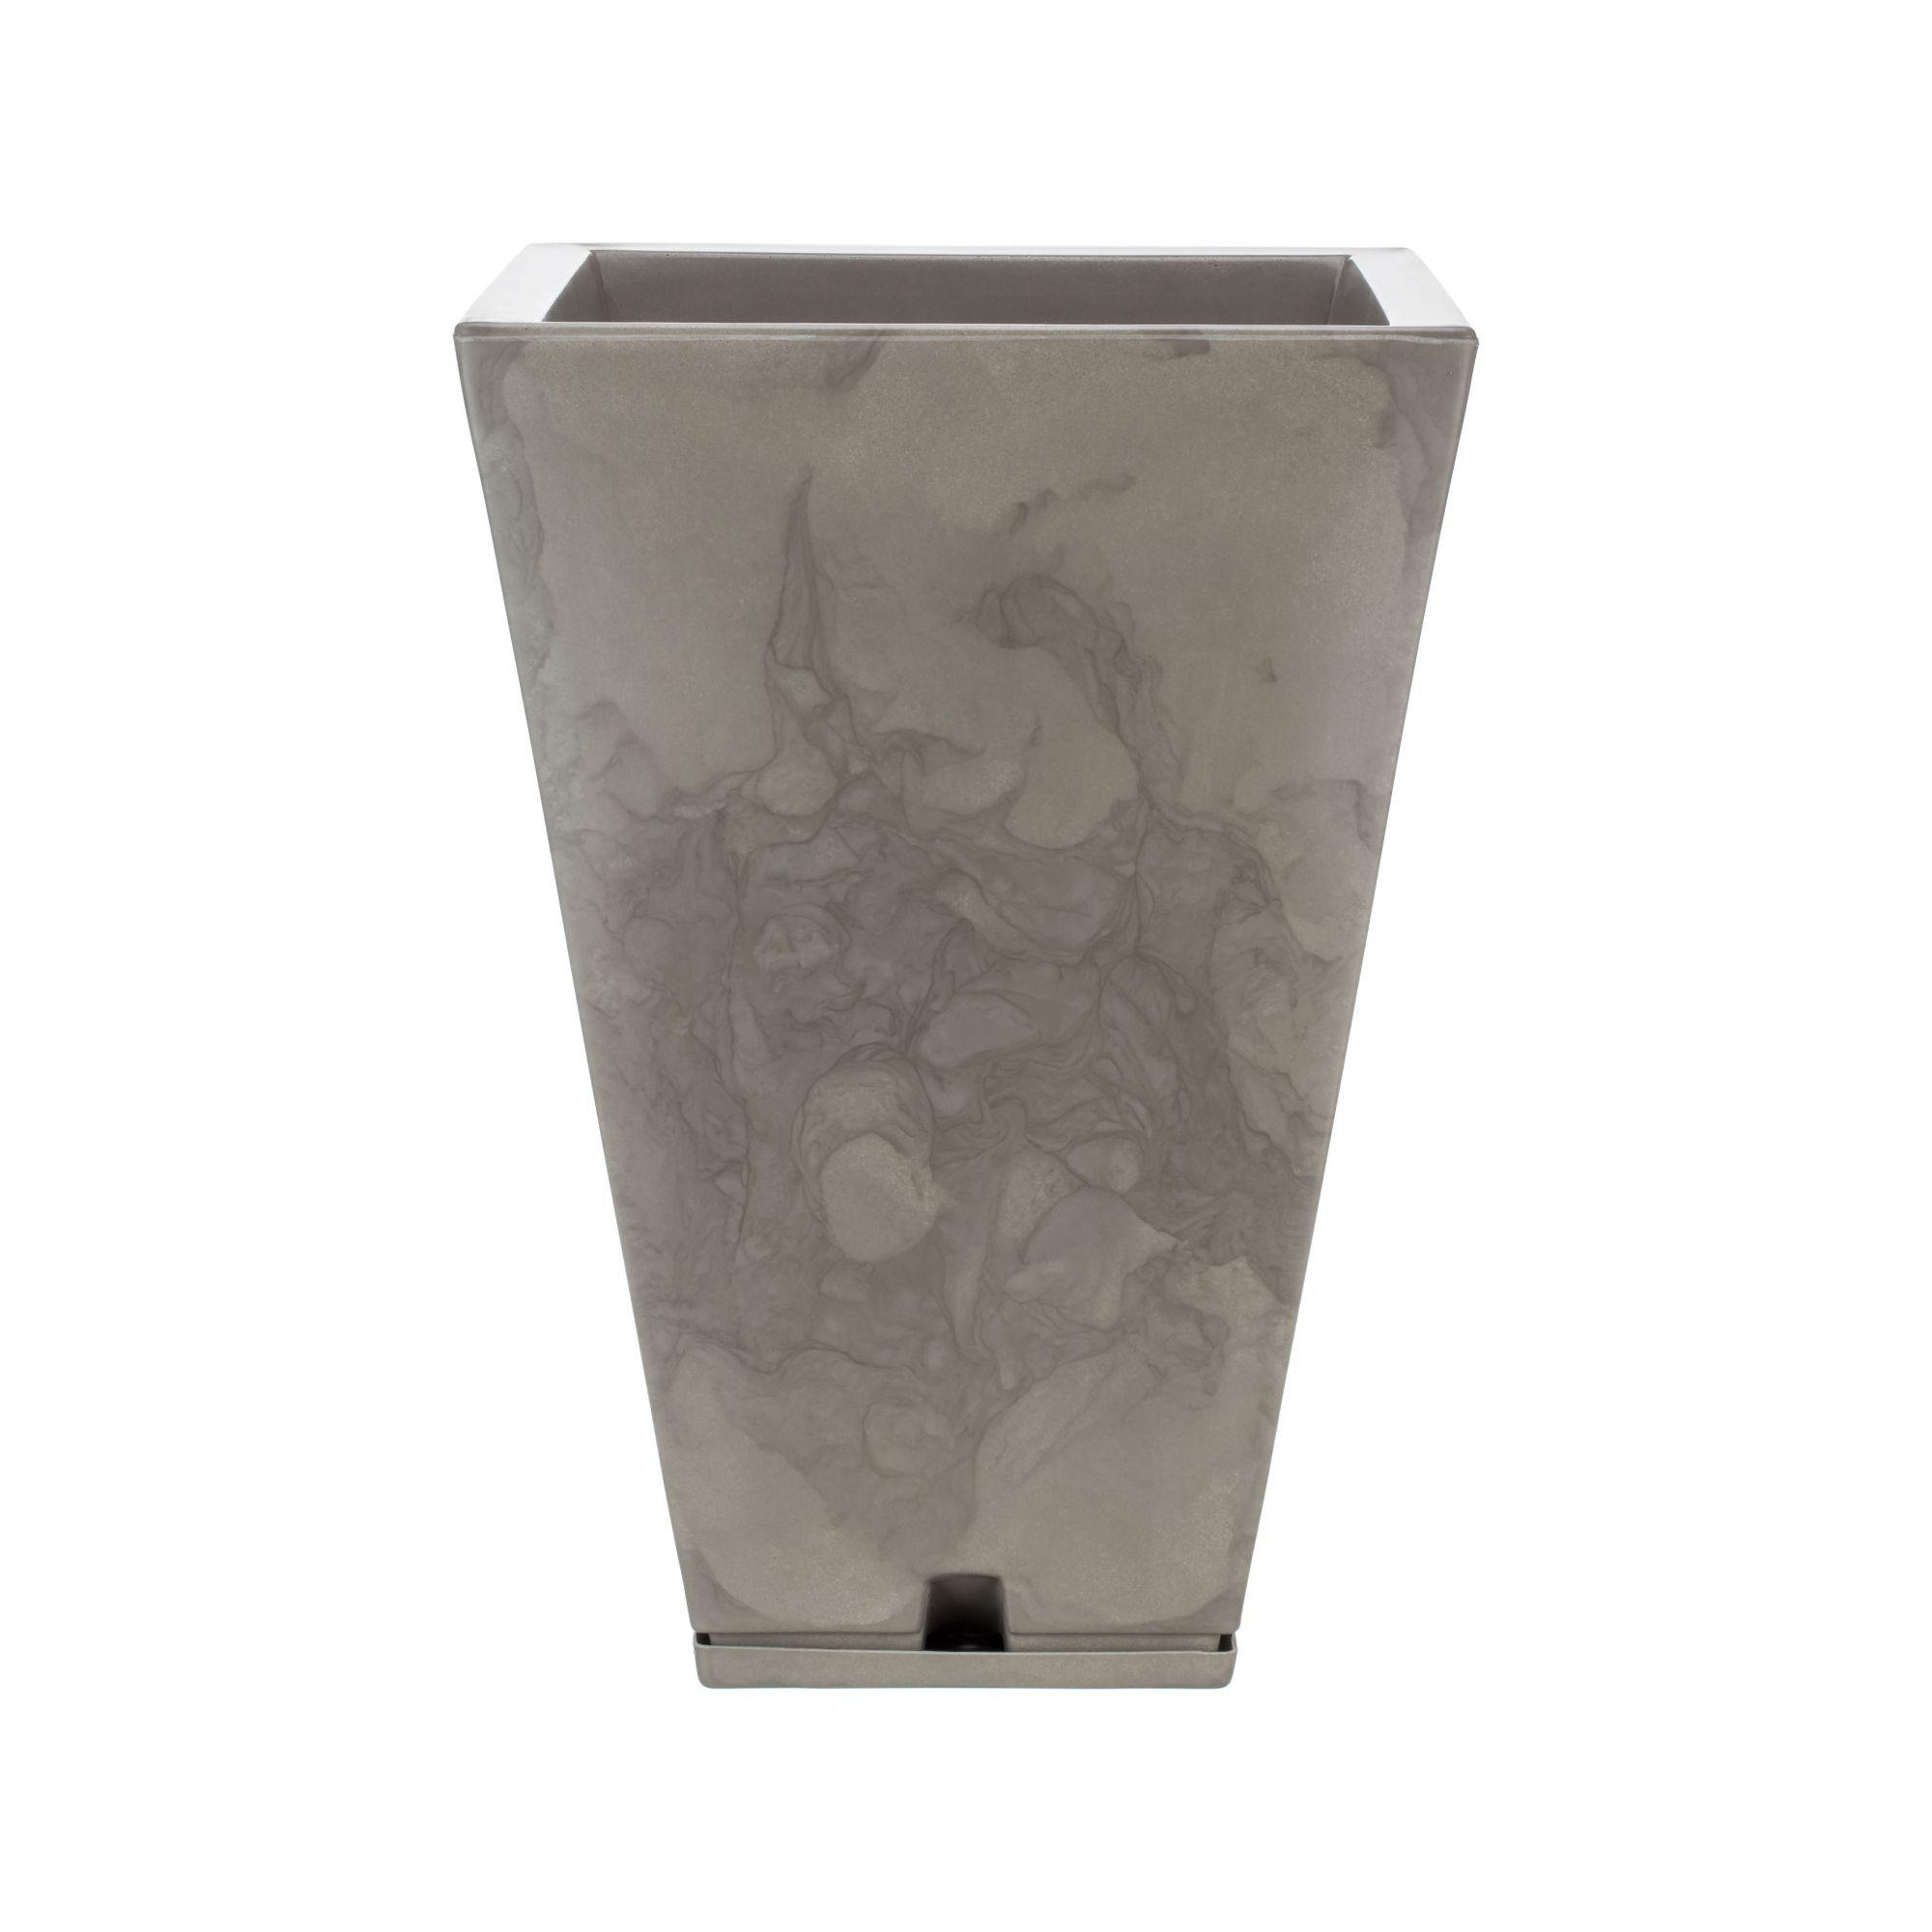 Vaso Zurique Marmorato Bege - 32cm x 55cm